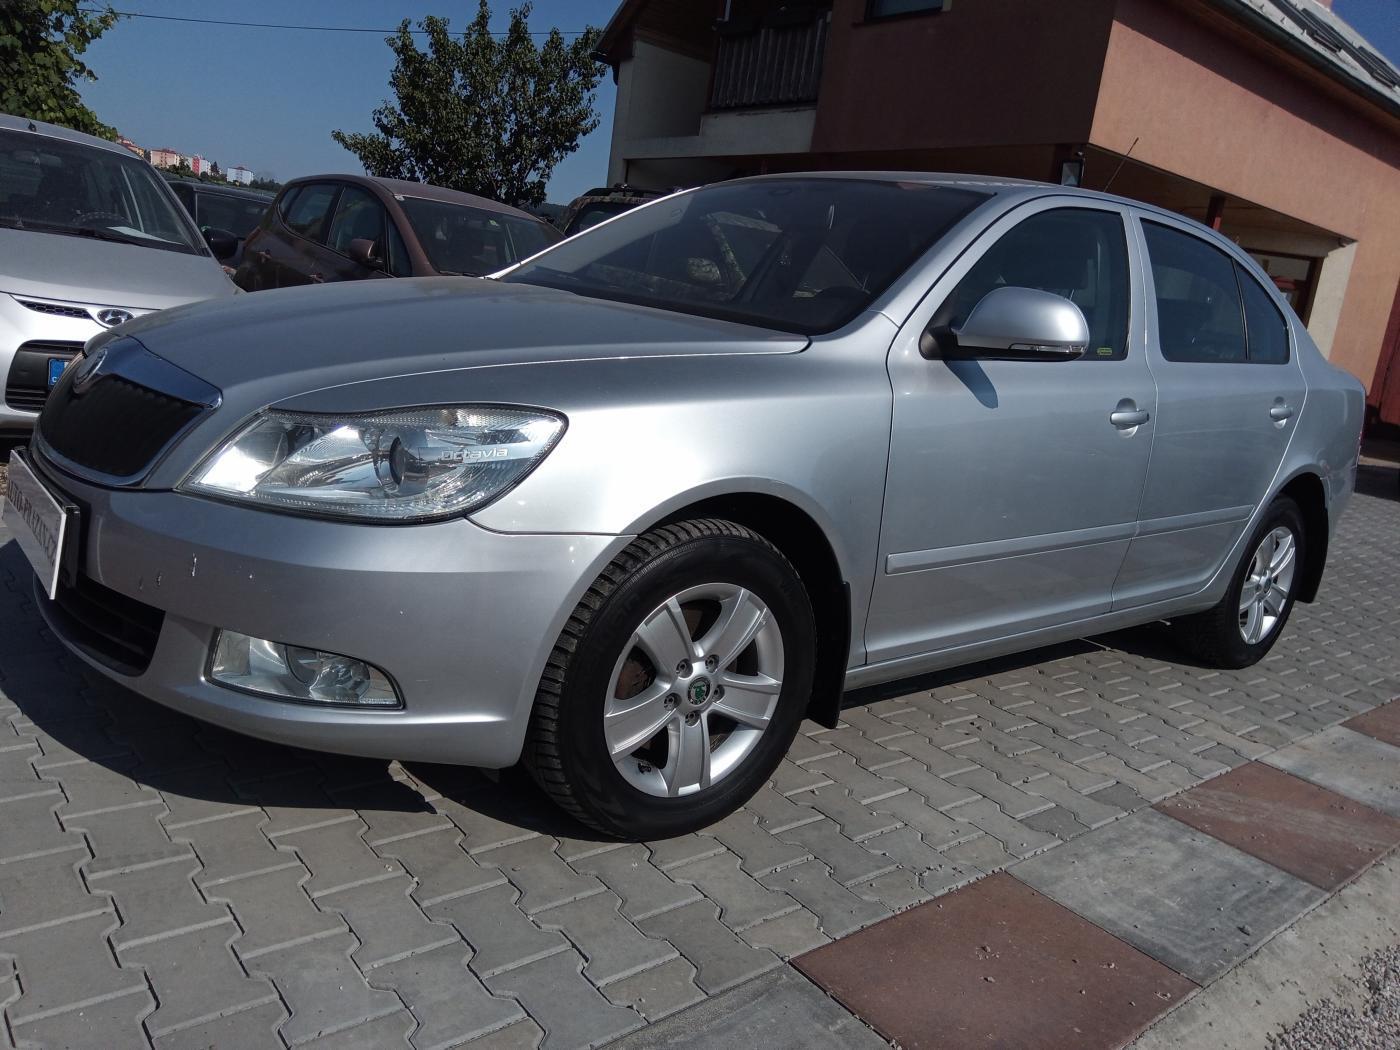 Škoda Octavia 2.0 TDI PD Ambiente sedan